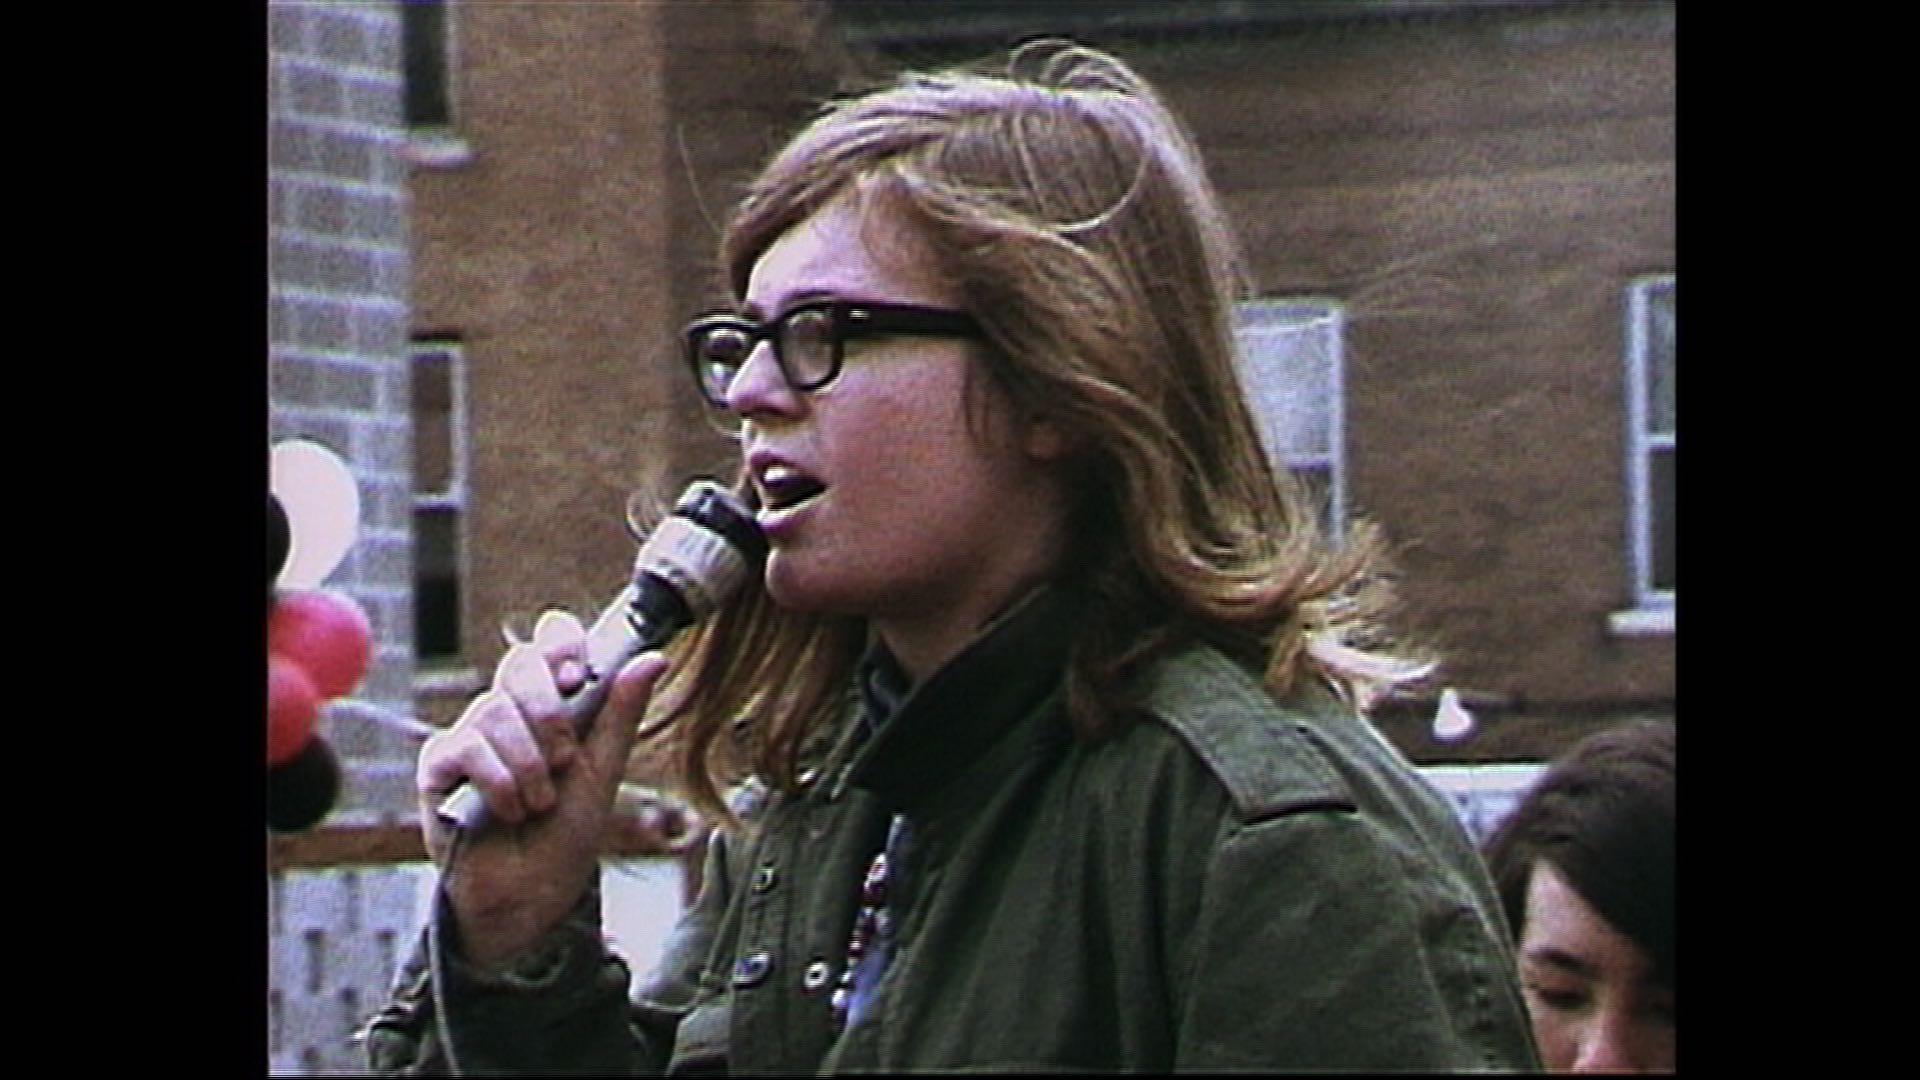 Red Barn - Ellen Pence on mic.jpg